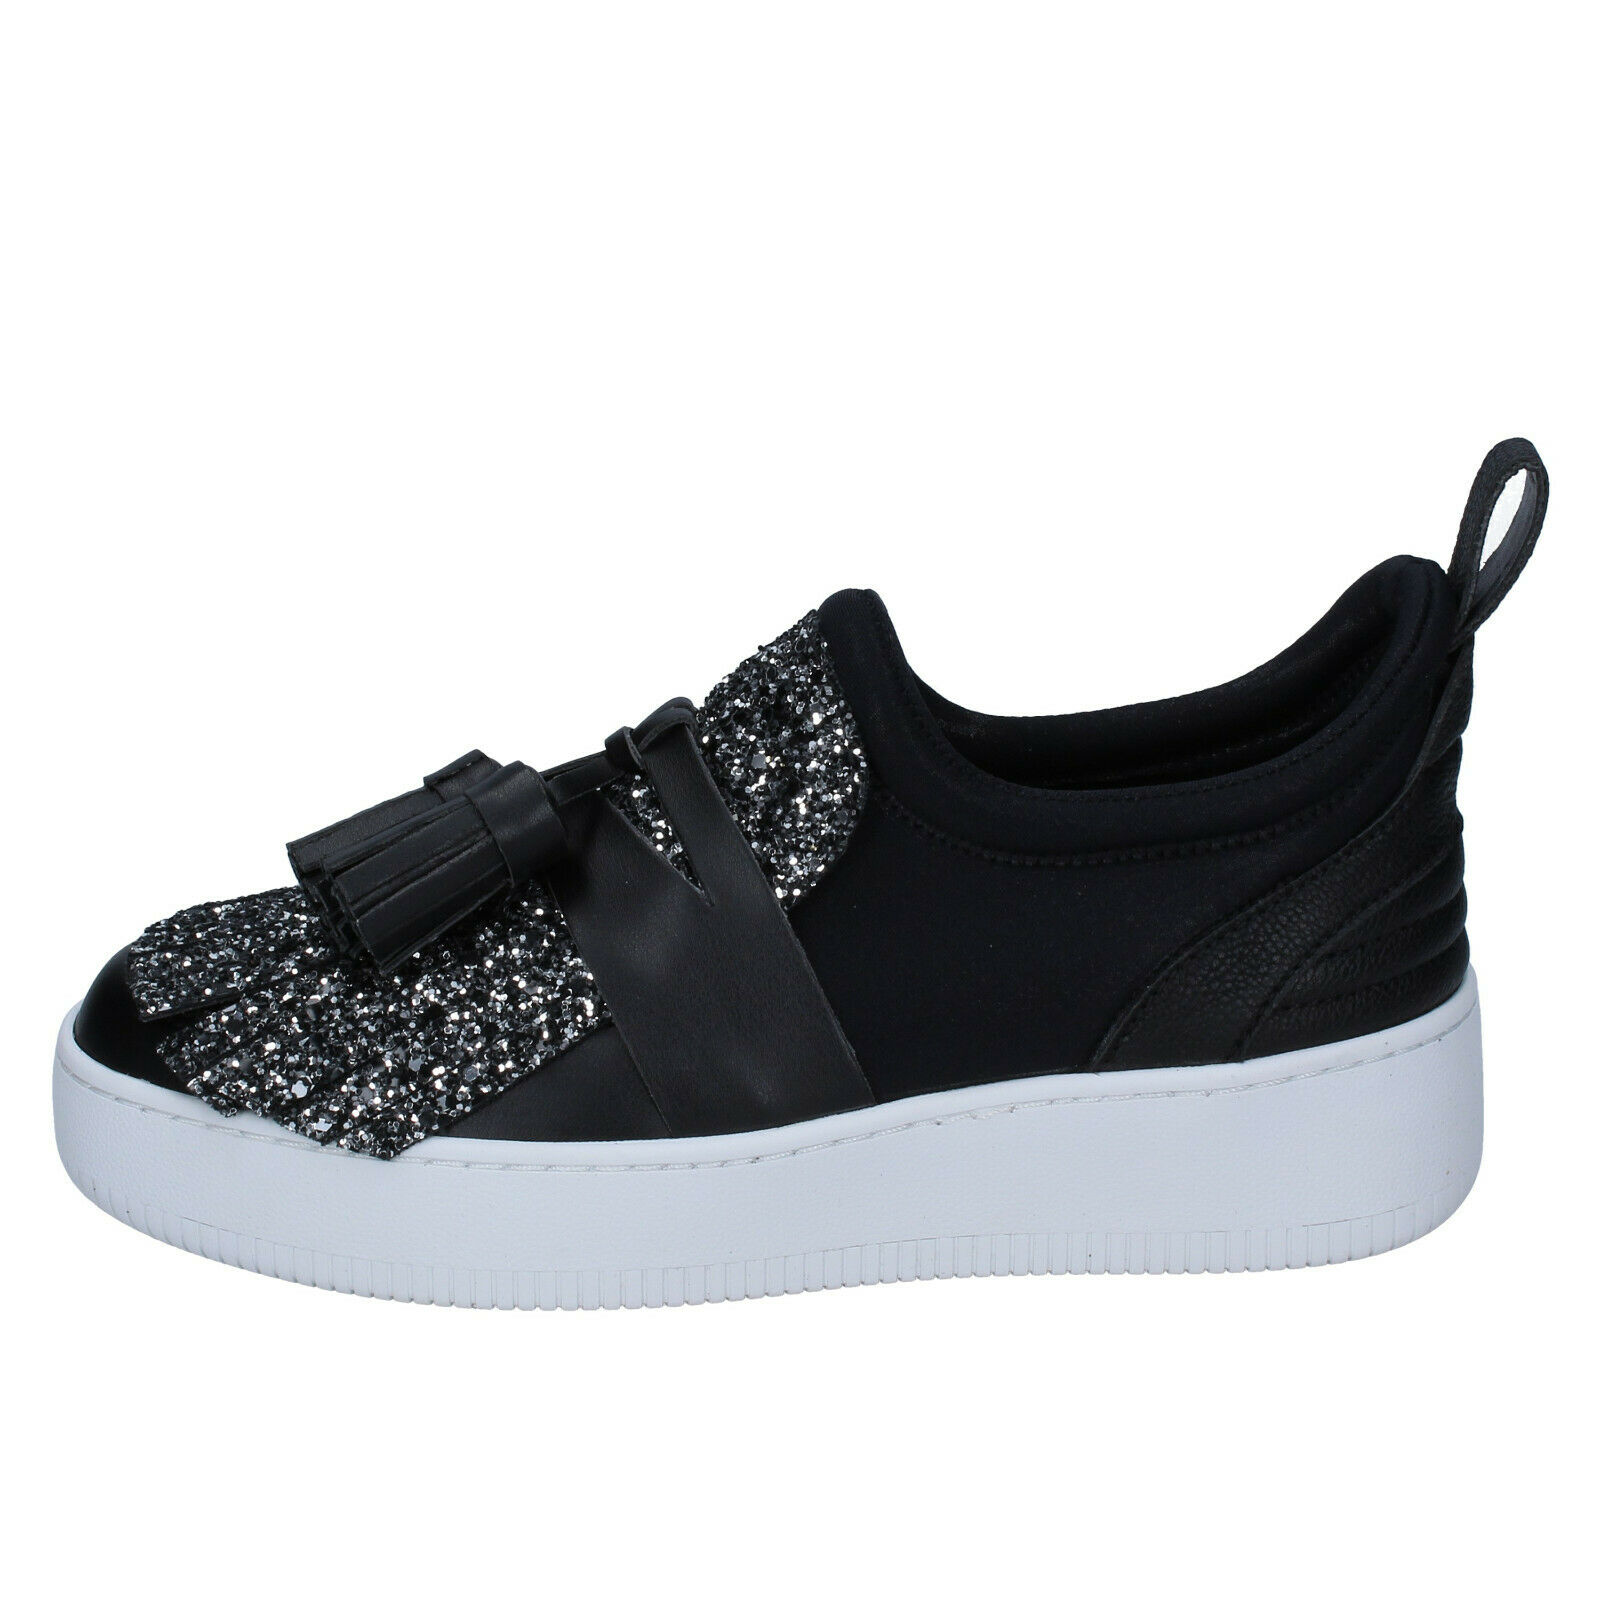 Womens shoes MY GREY MER 5 (EU 38) moccasins moccasins moccasins silver black glitter BS626-38 9774eb